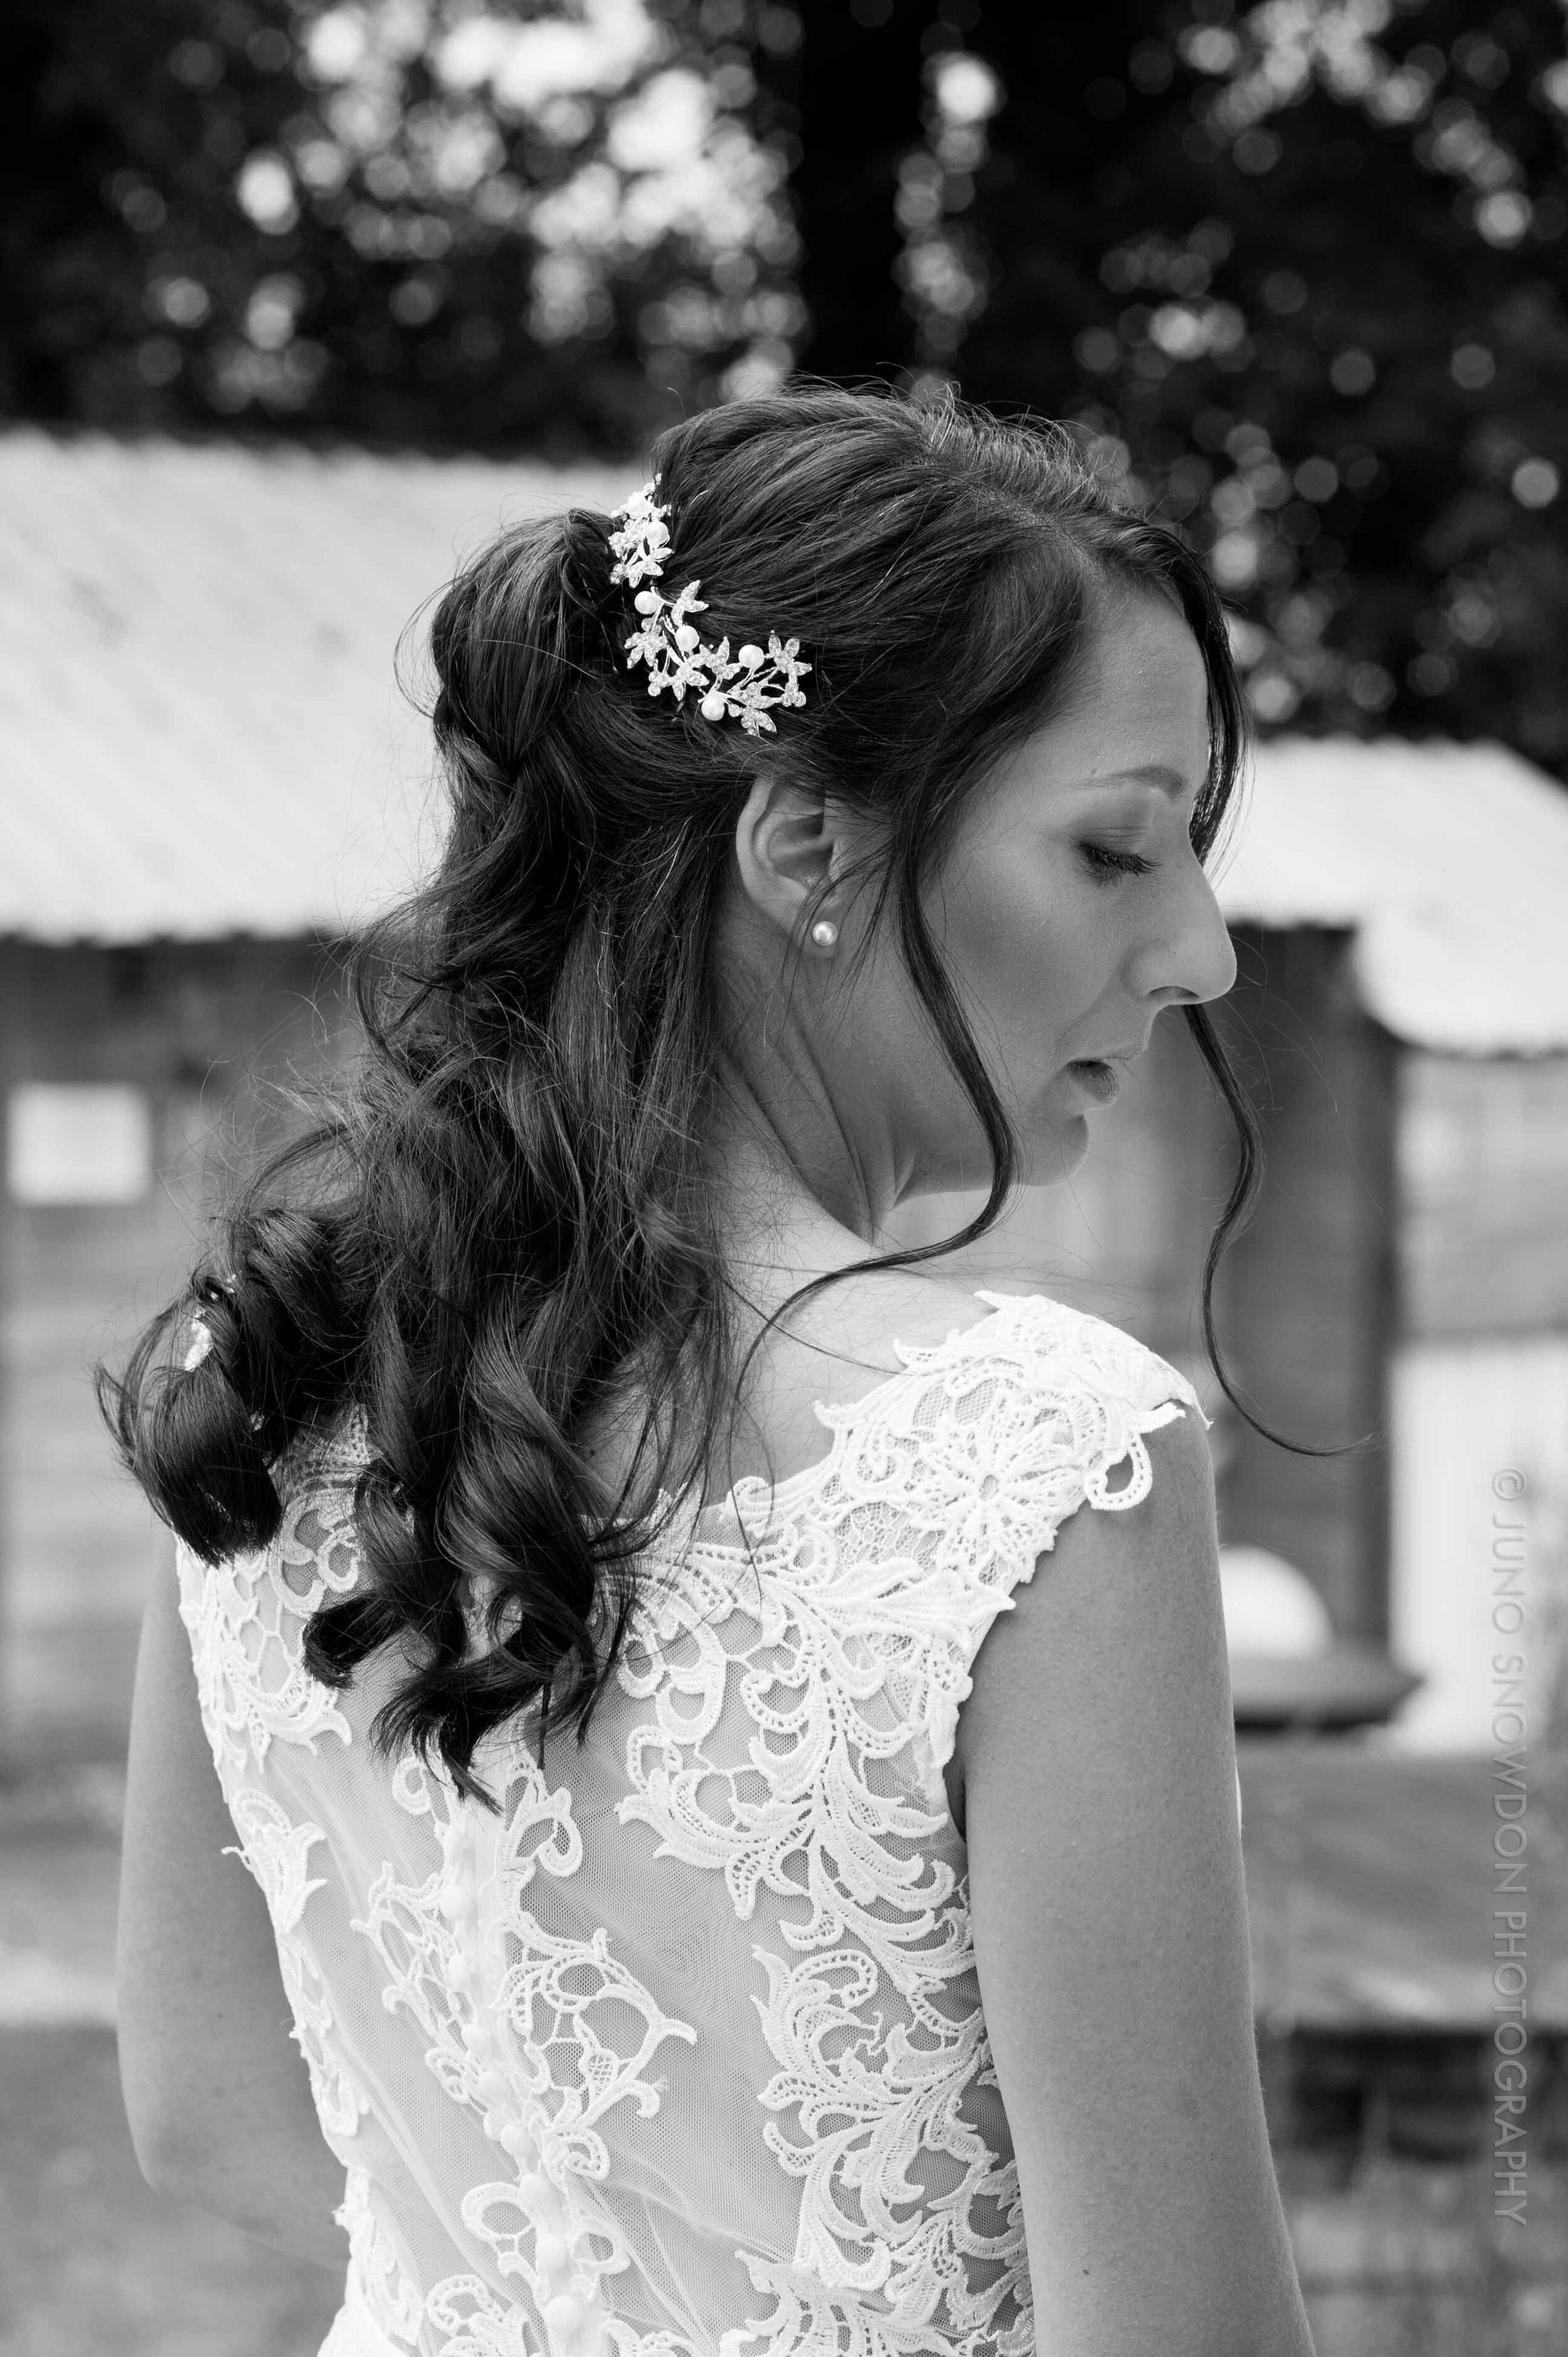 juno-snowdon-photography-wedding-0796.jpg